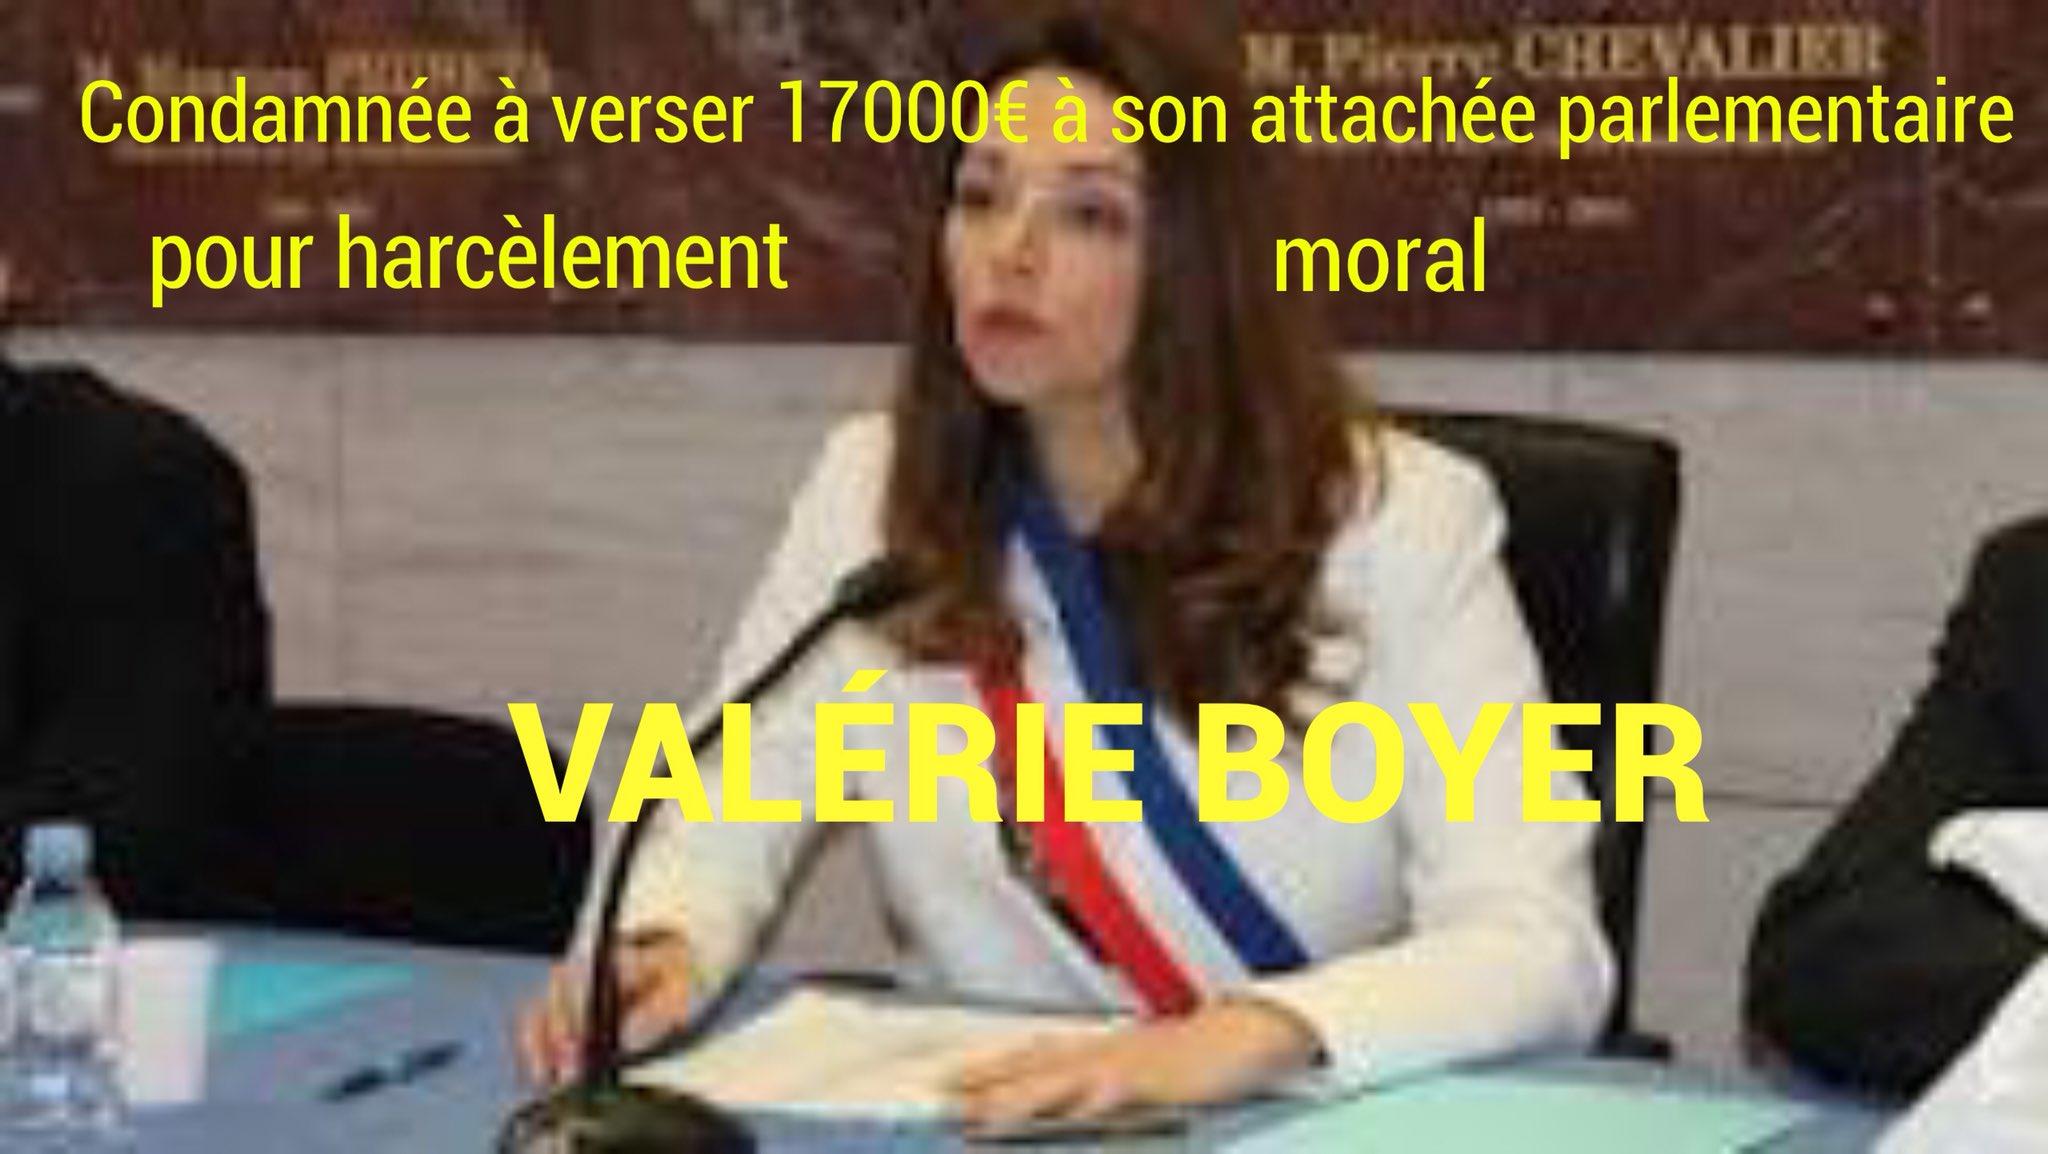 @ericbrunet @VerlaineDJENI @FrancoisFillon @Elysee @HerveLehman Heureusement qu'ils l'ont stoppé le truand Fillon! https://t.co/1eYn96fLyT